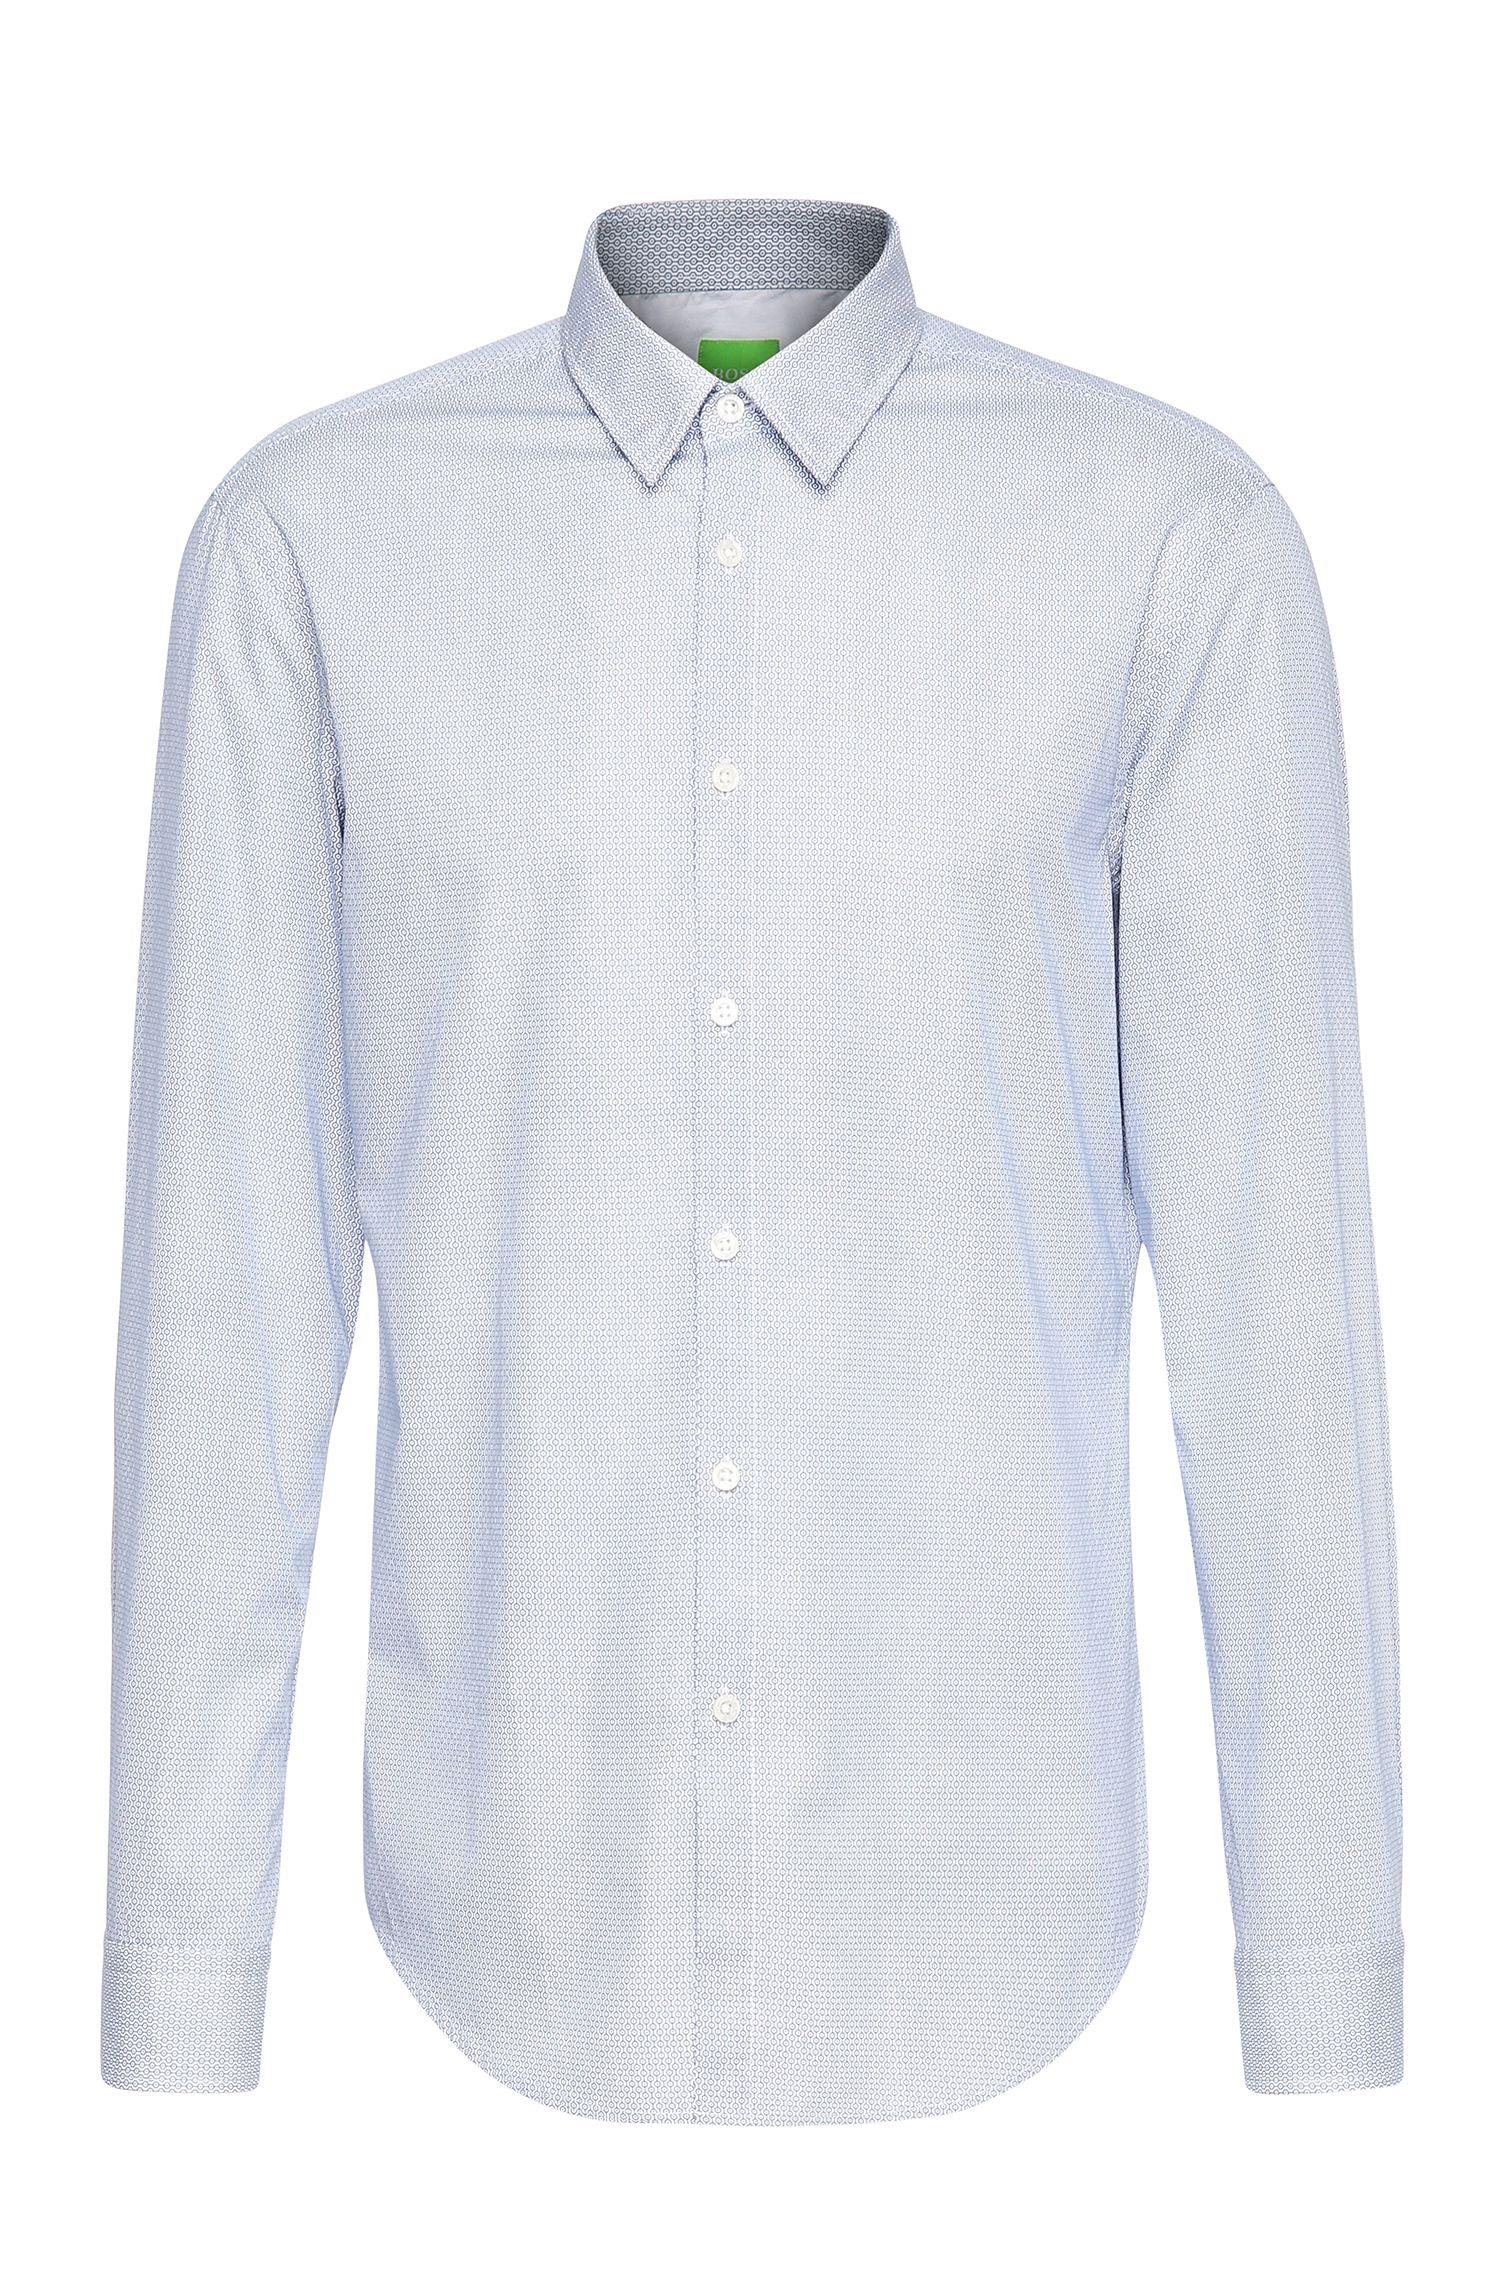 'C-Bustai' | Modern Fit, Cotton Button Down Shirt